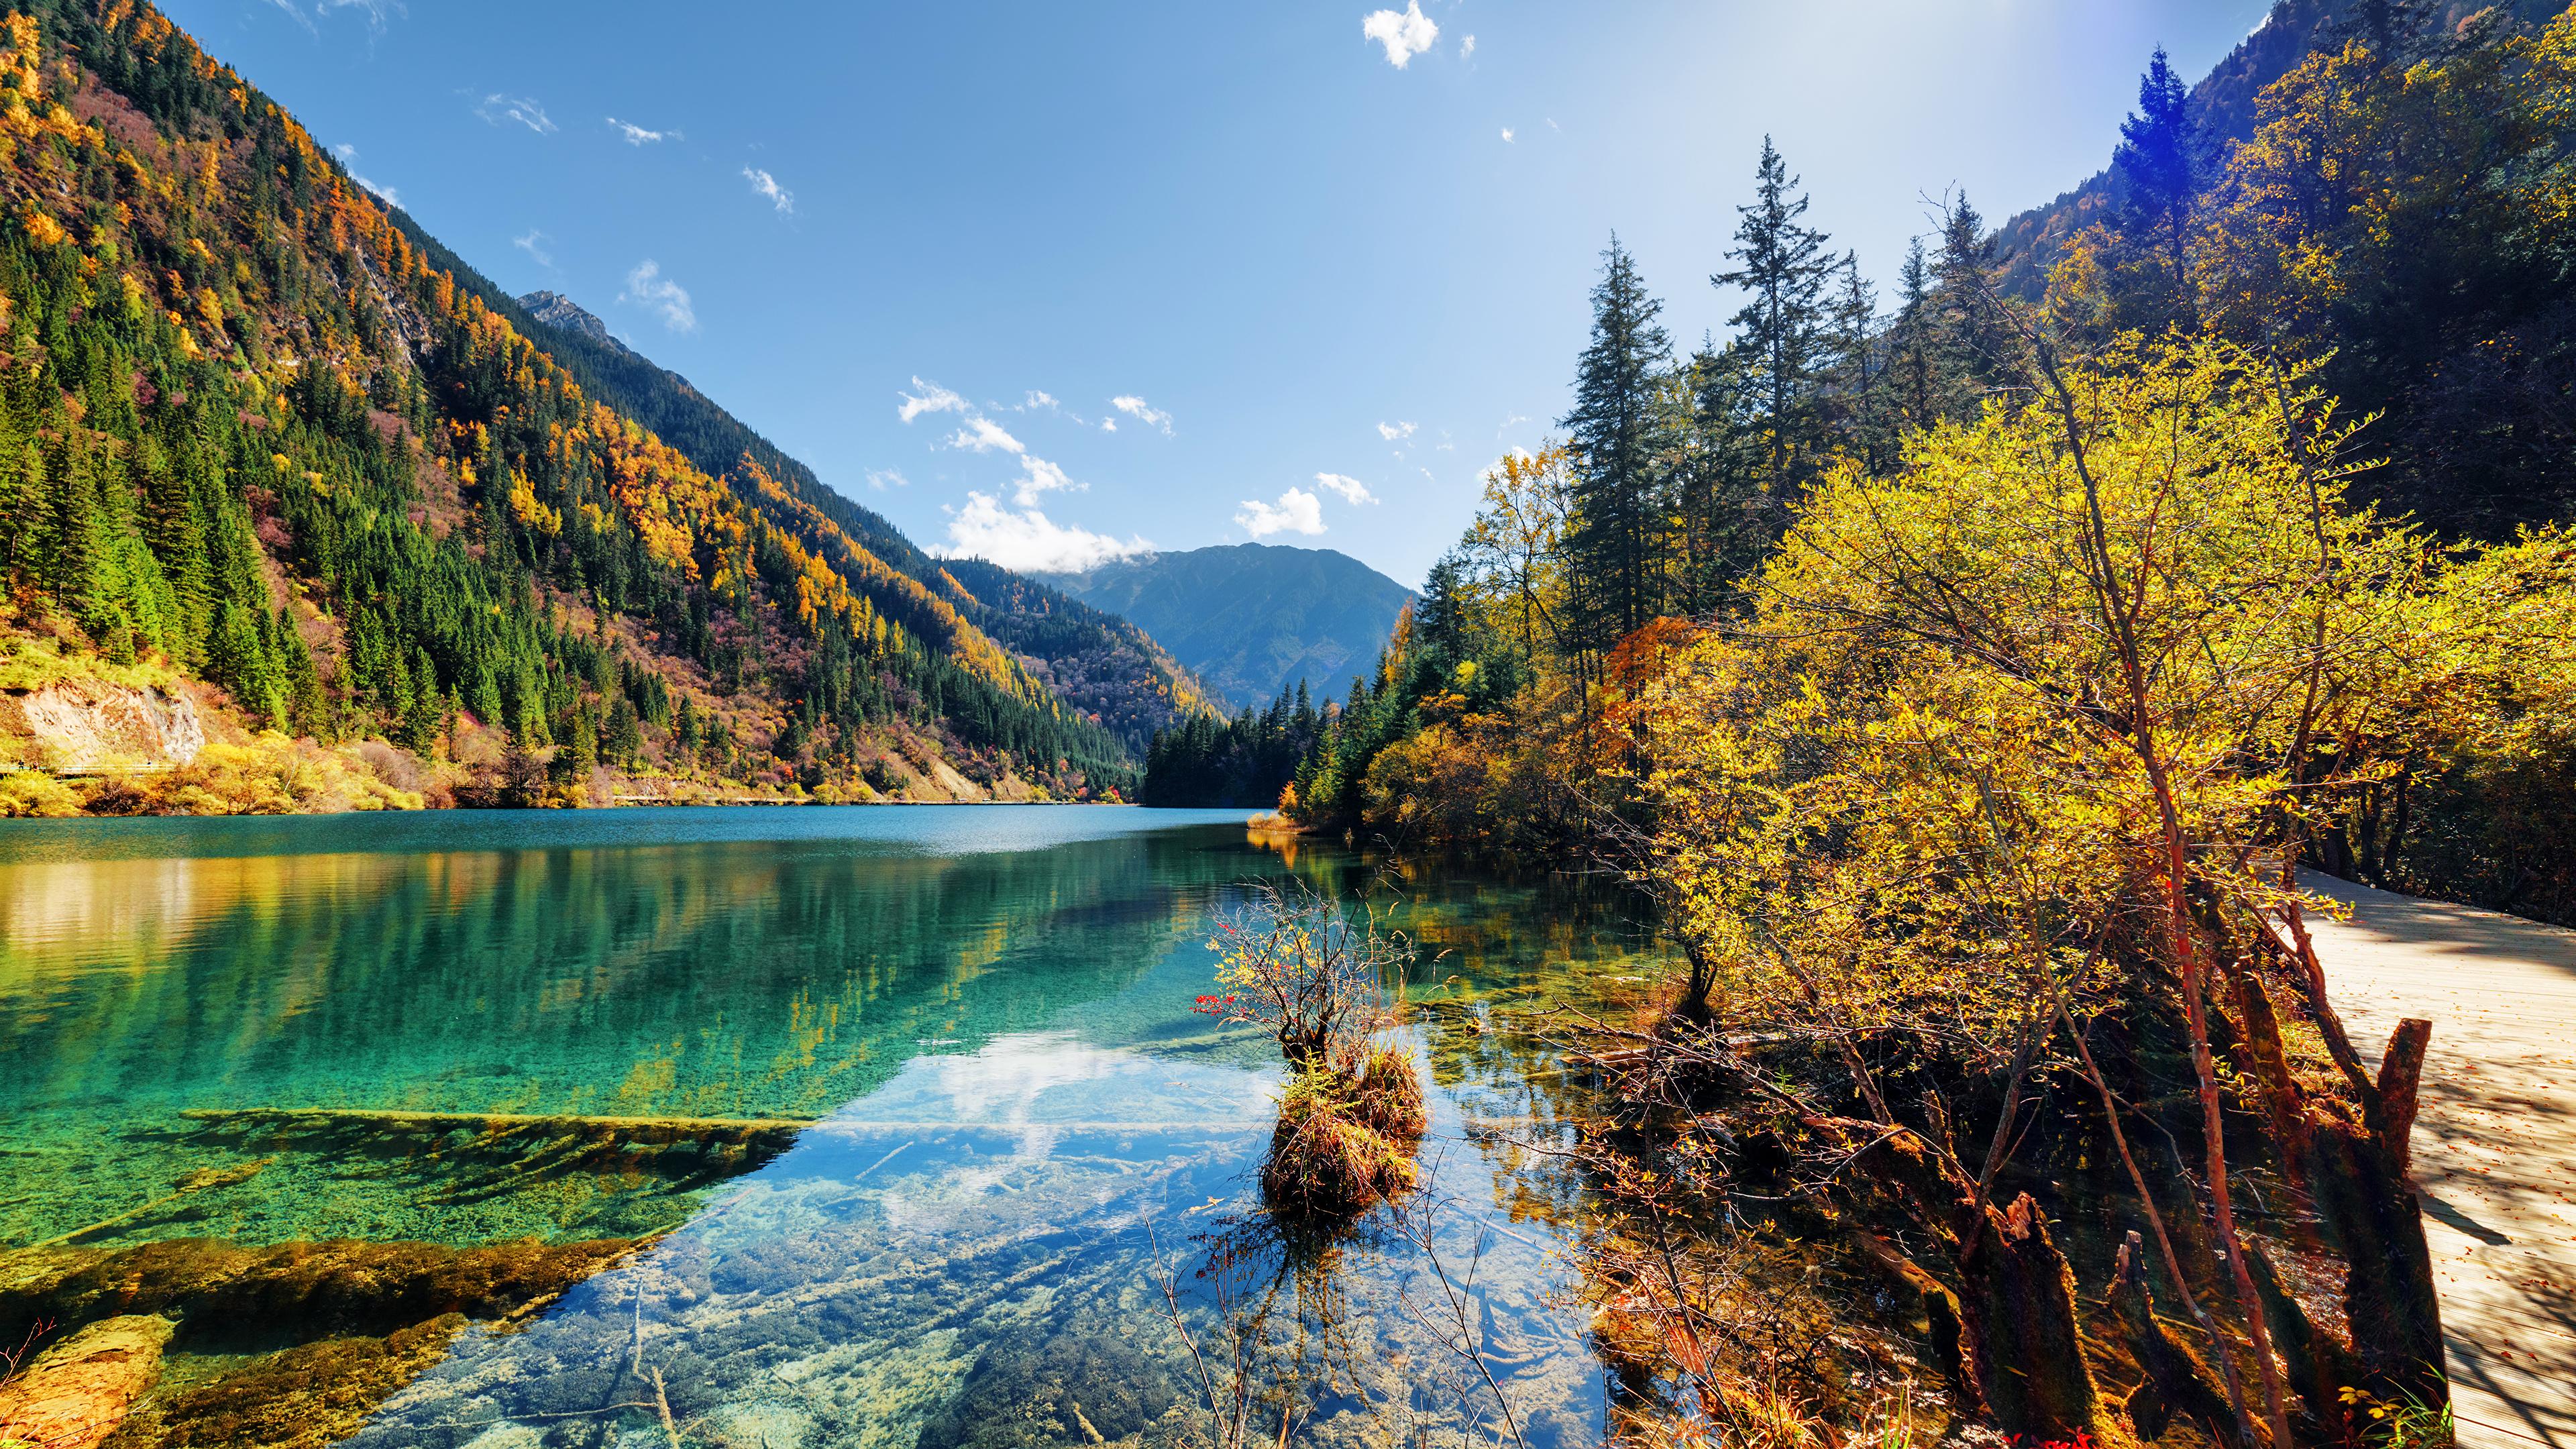 foto de Fonds d'ecran 3840x2160 Vallée de Jiuzhaigou Chine Parc